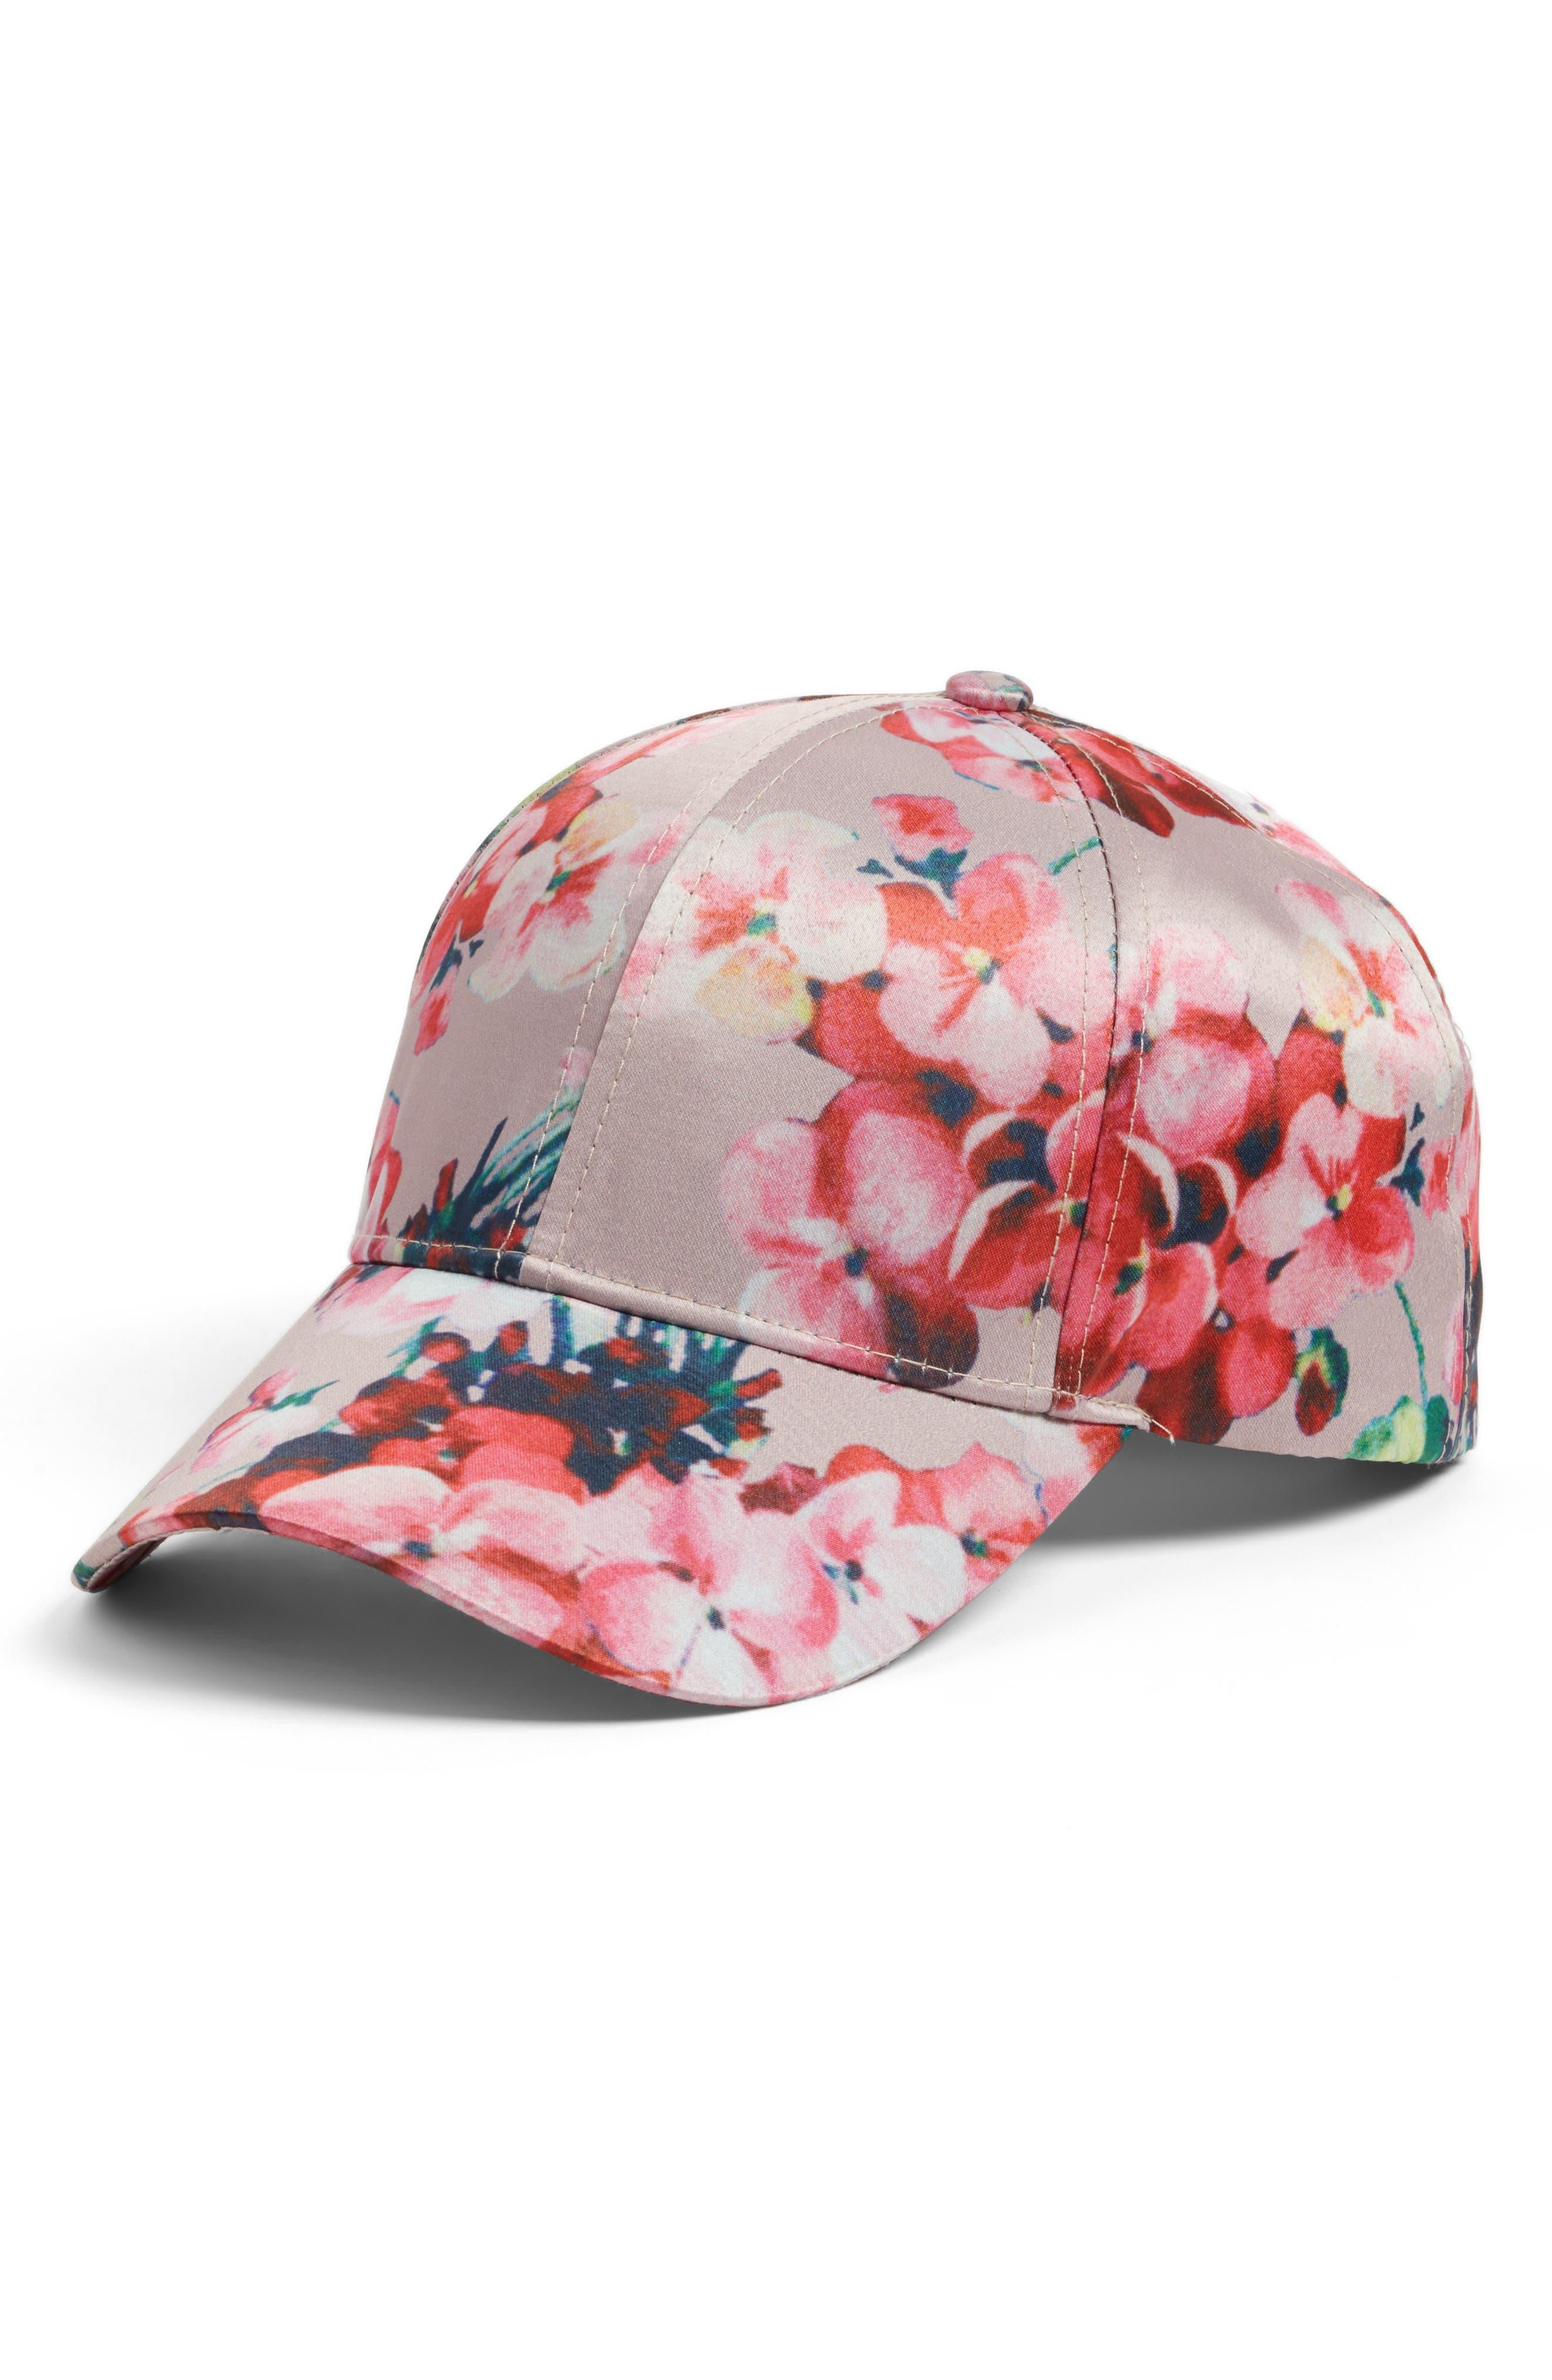 Collection XIIX Floral Print Baseball Cap